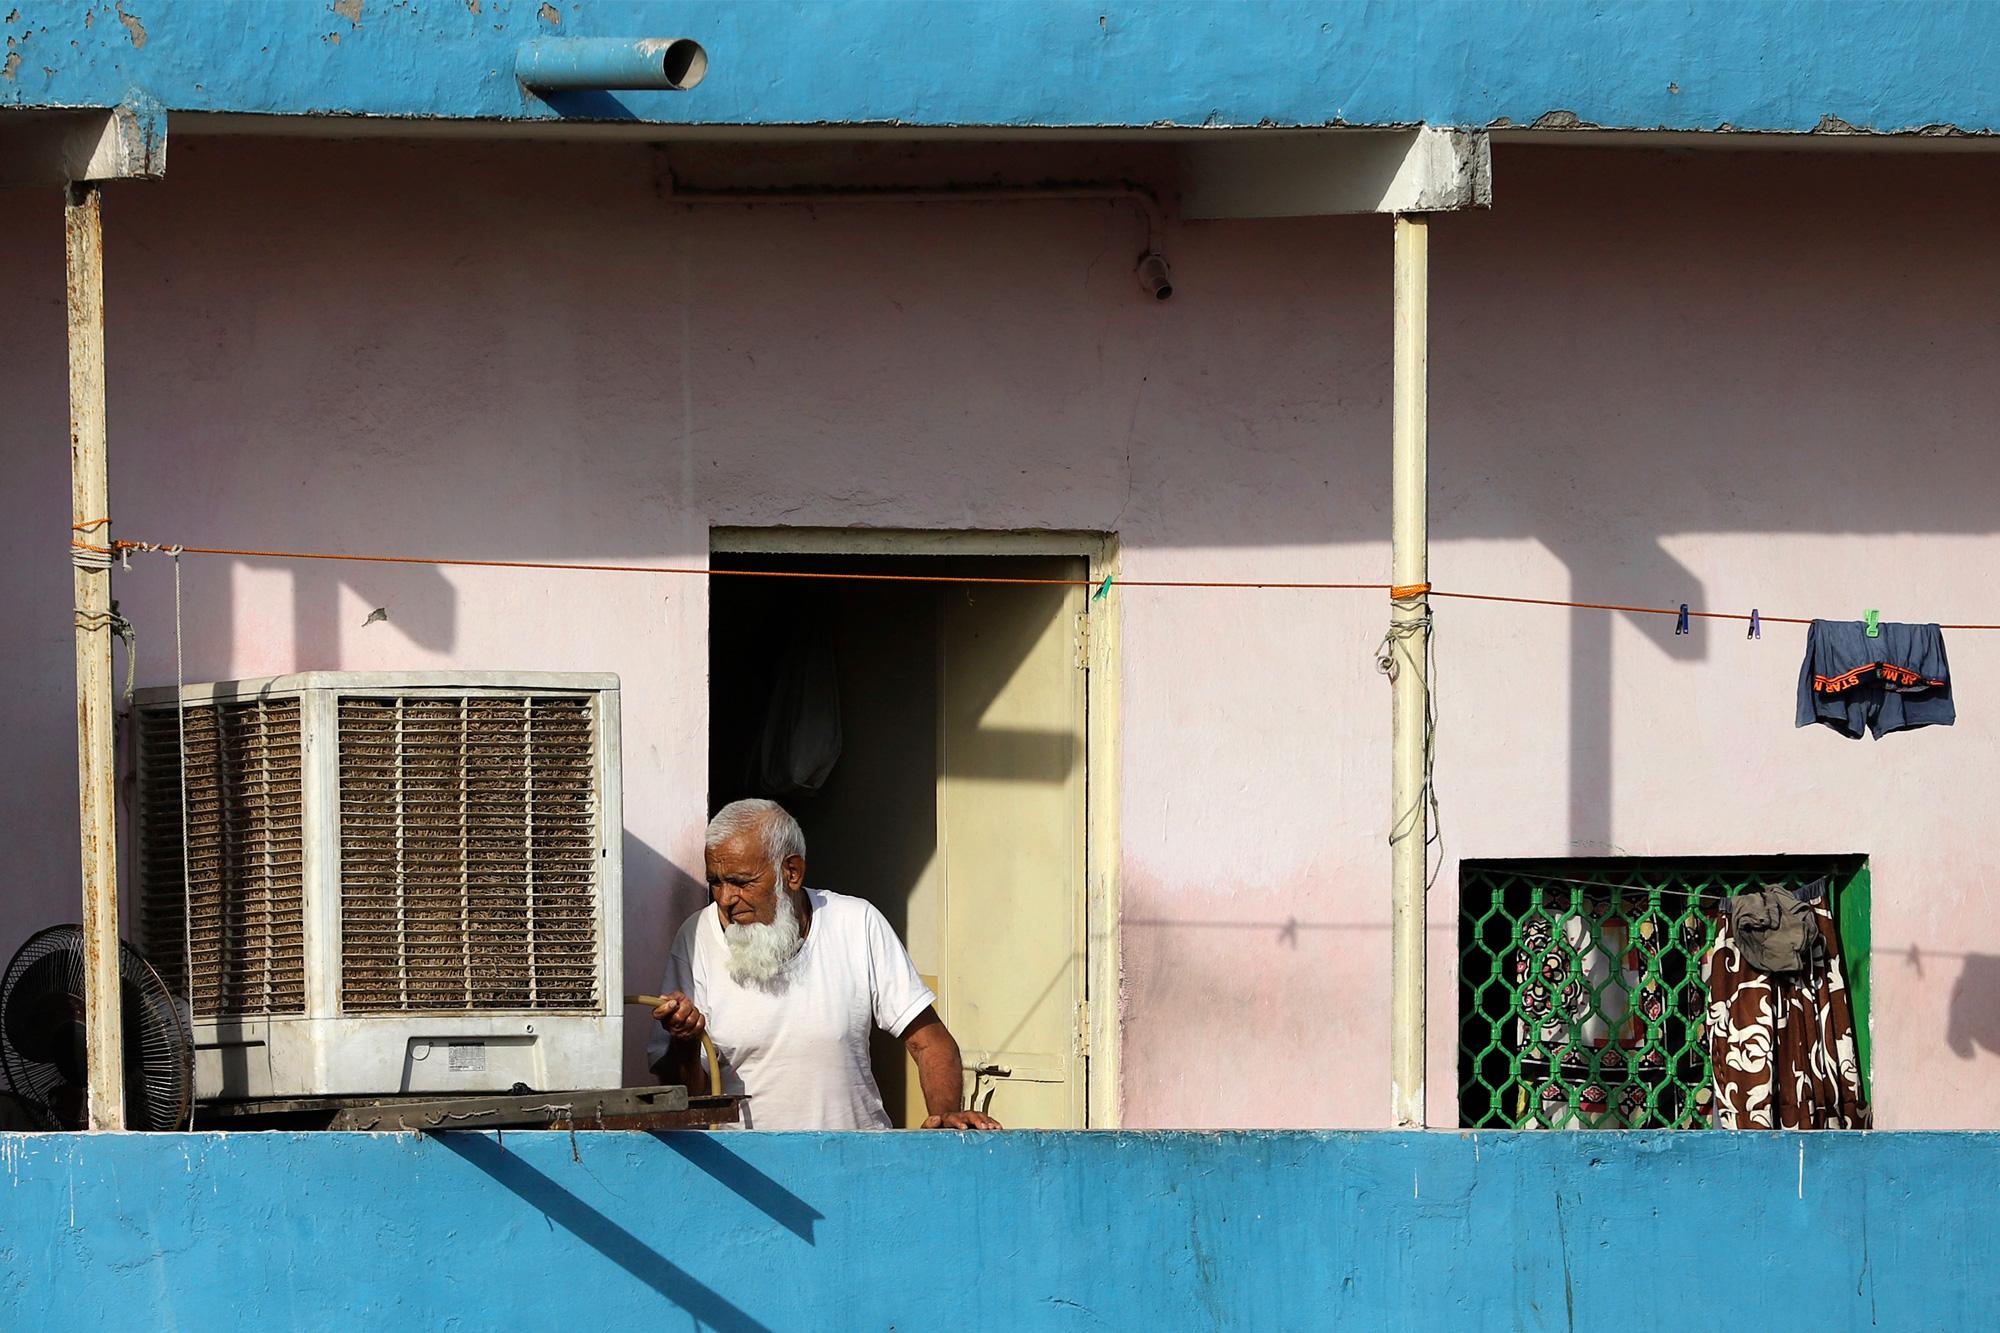 Older man on a balcony pours himself water in Delhi.